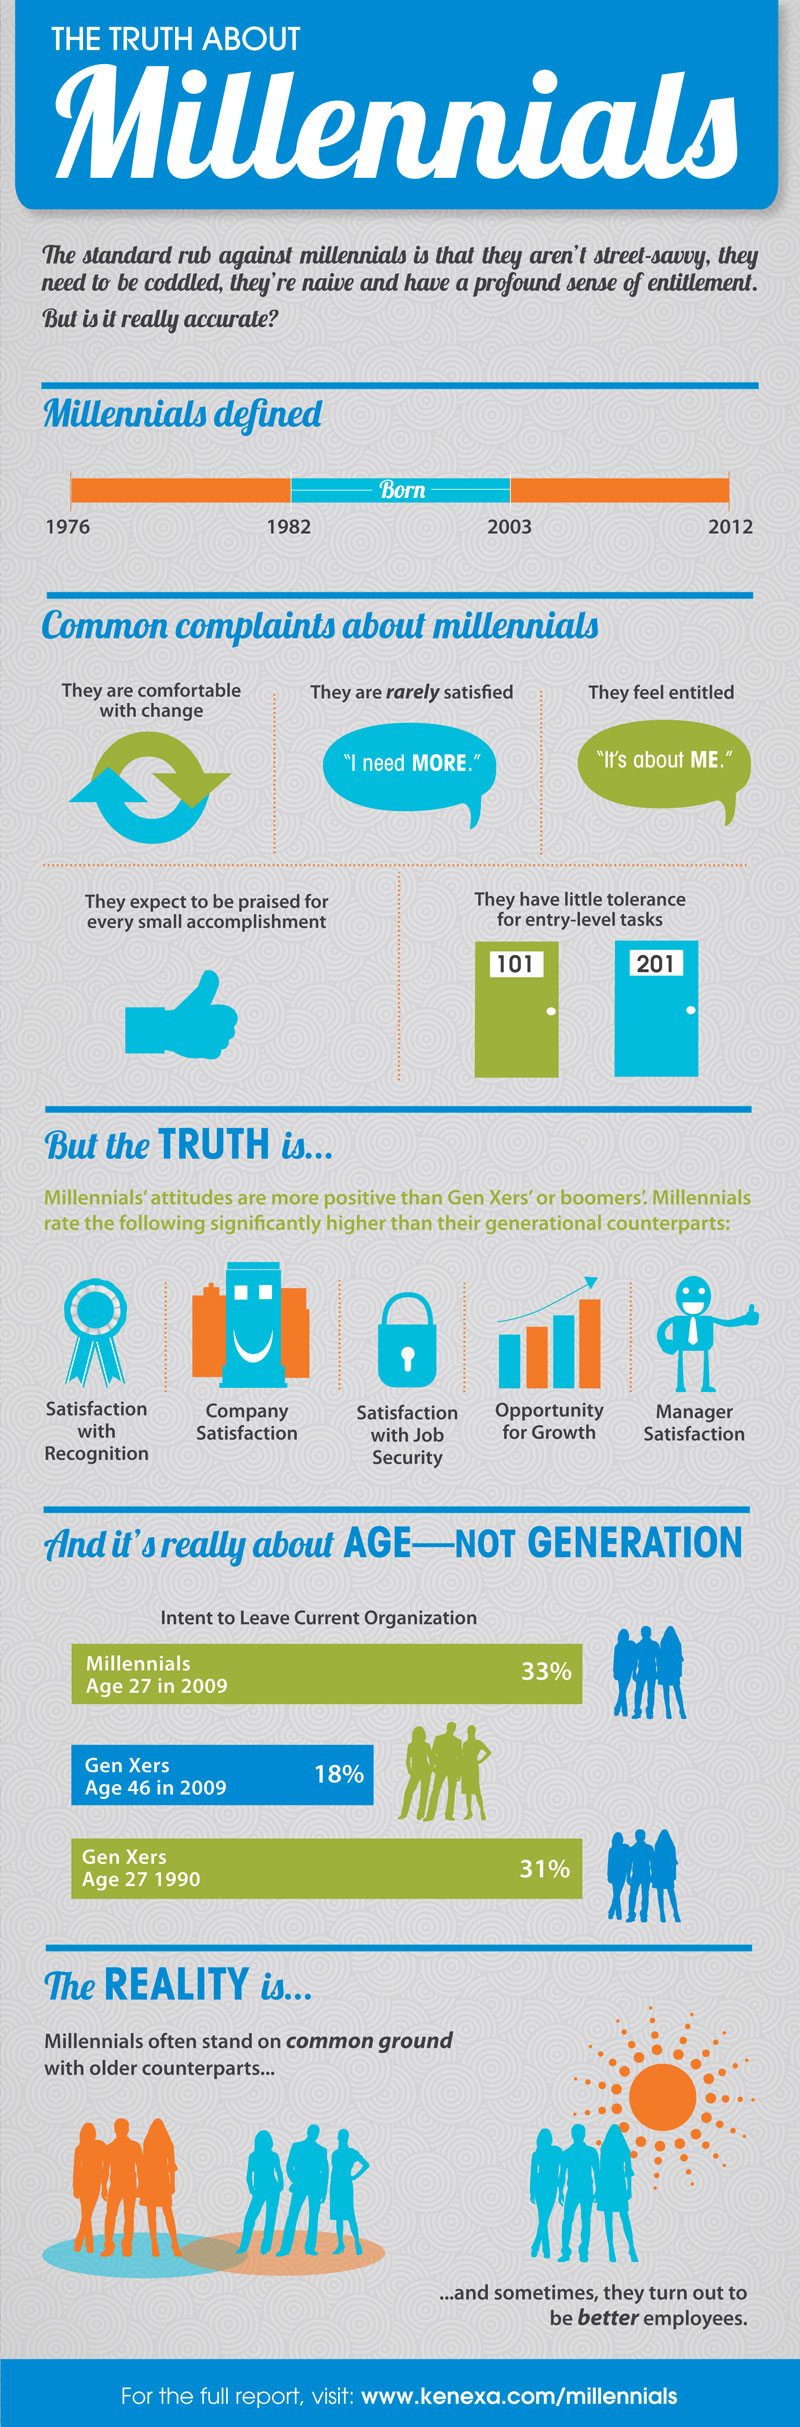 photo credit: infographics.com